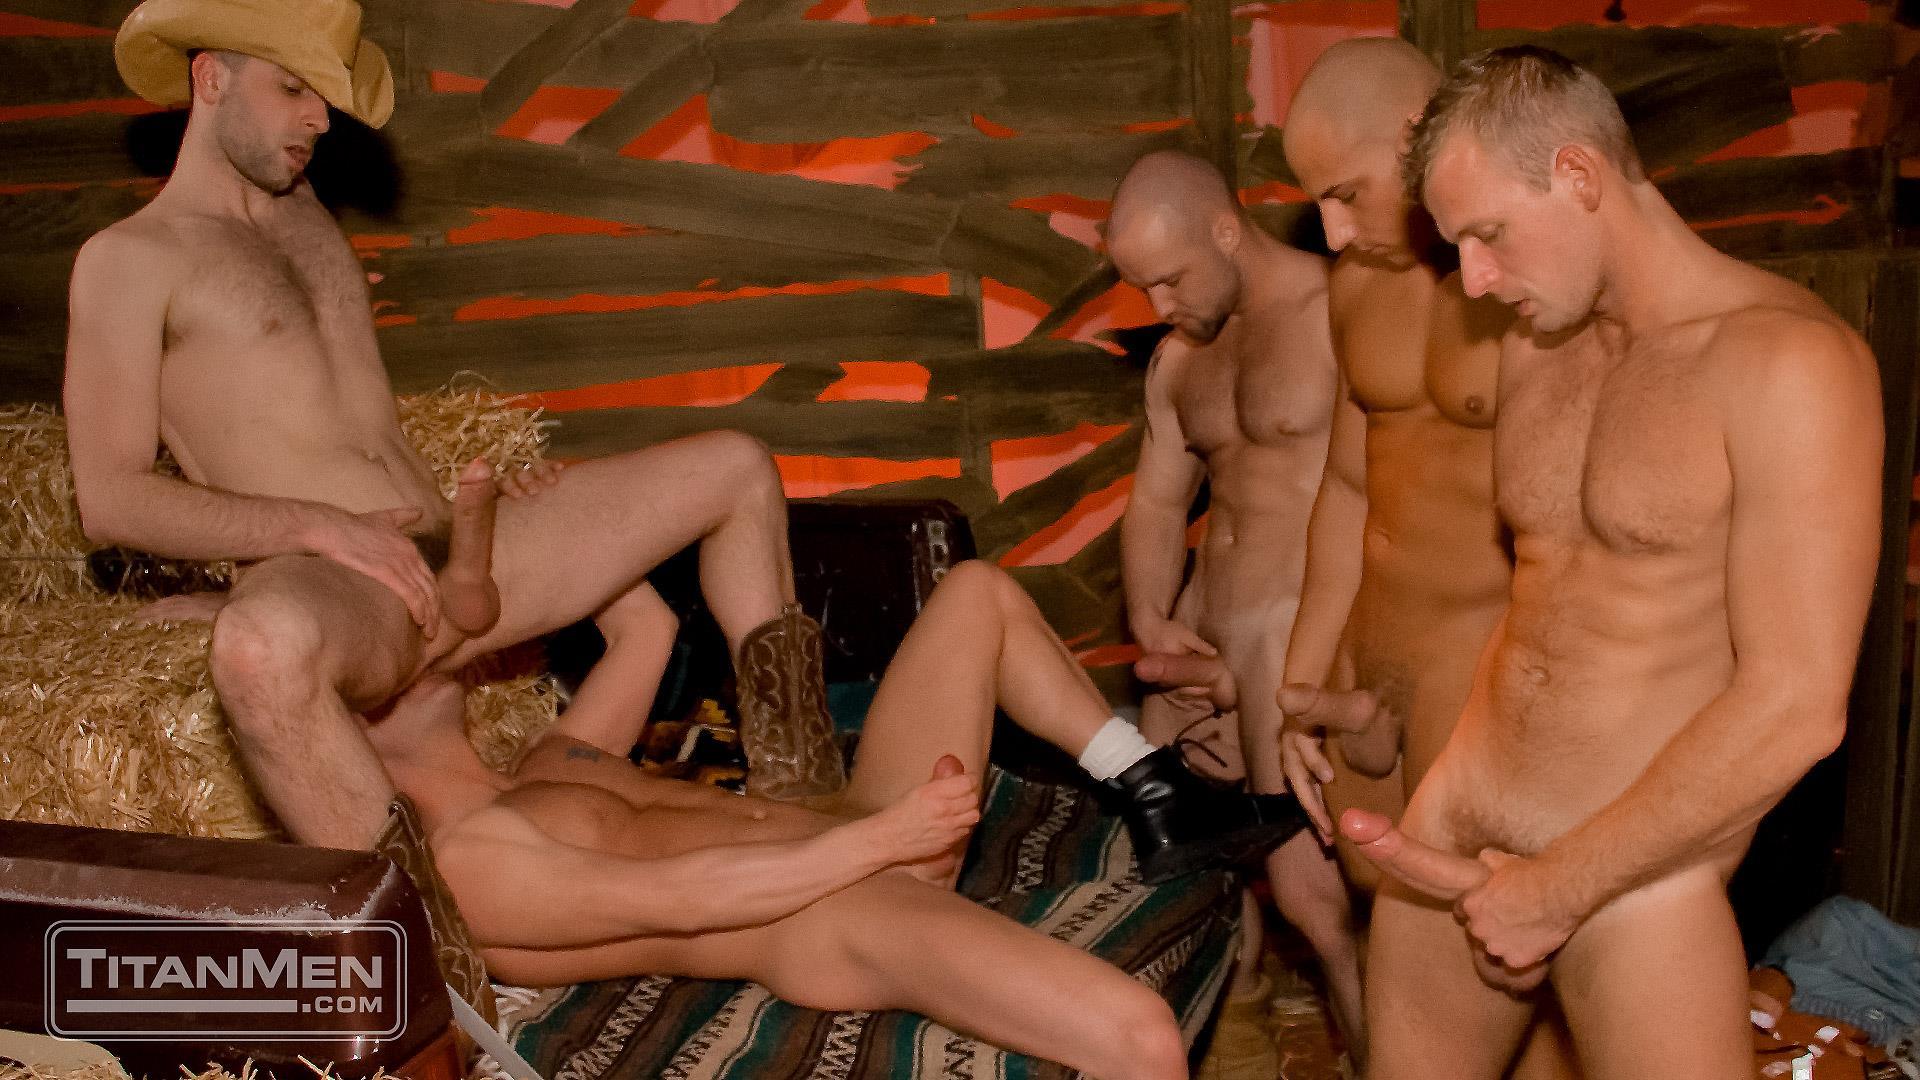 Redneck sex picture naked tube